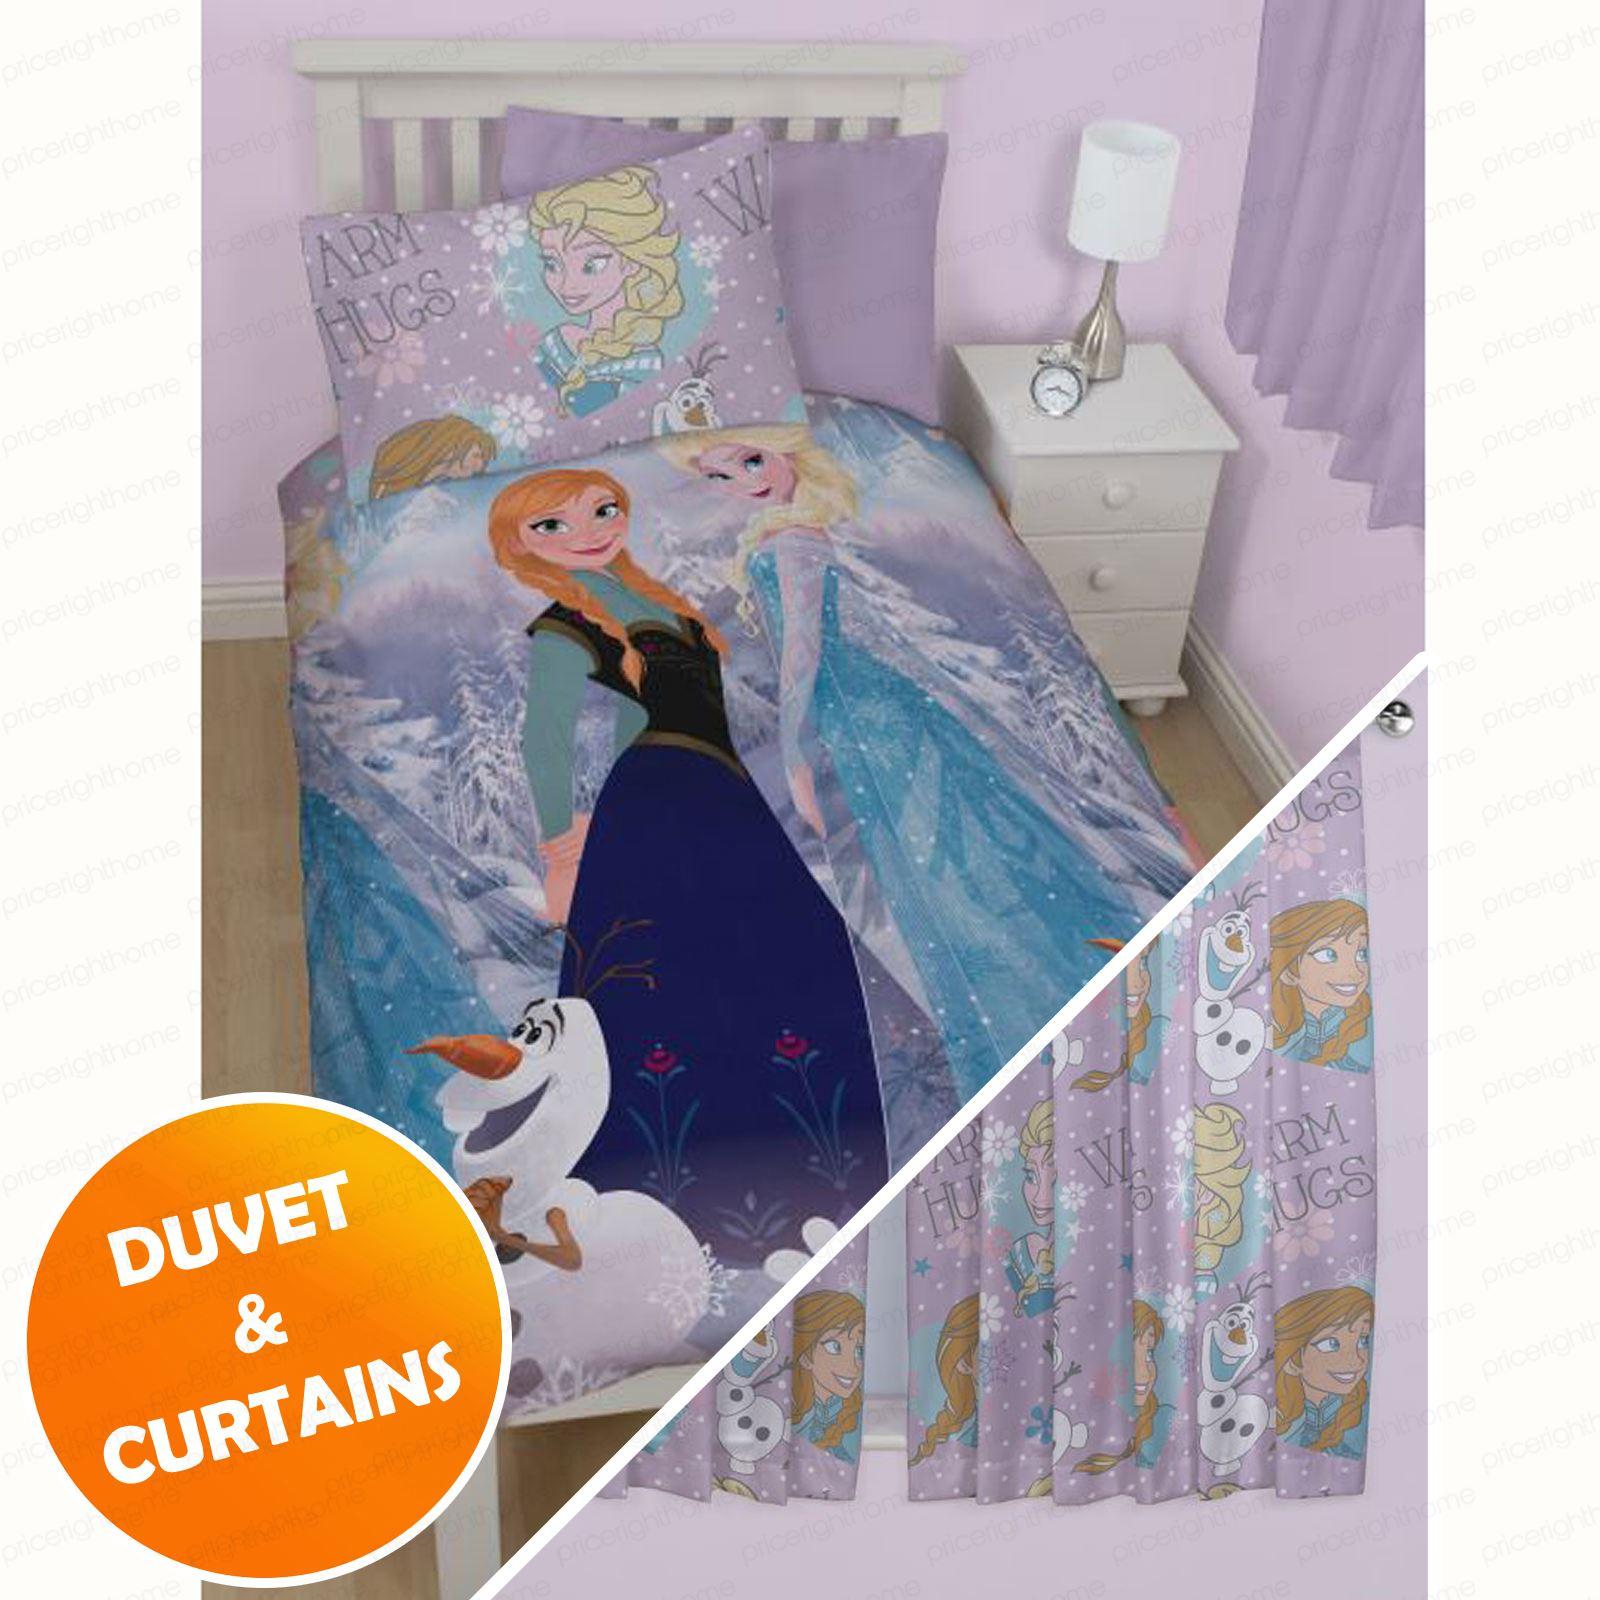 DISNEY FROZEN BEDROOM DUVET COVERS & MATCHING CURTAINS